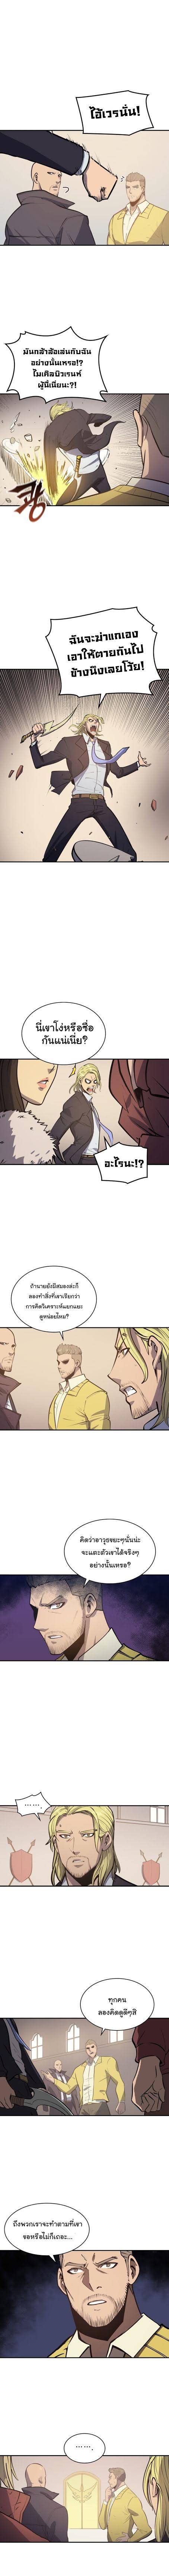 Max Level Returner - หน้า 6